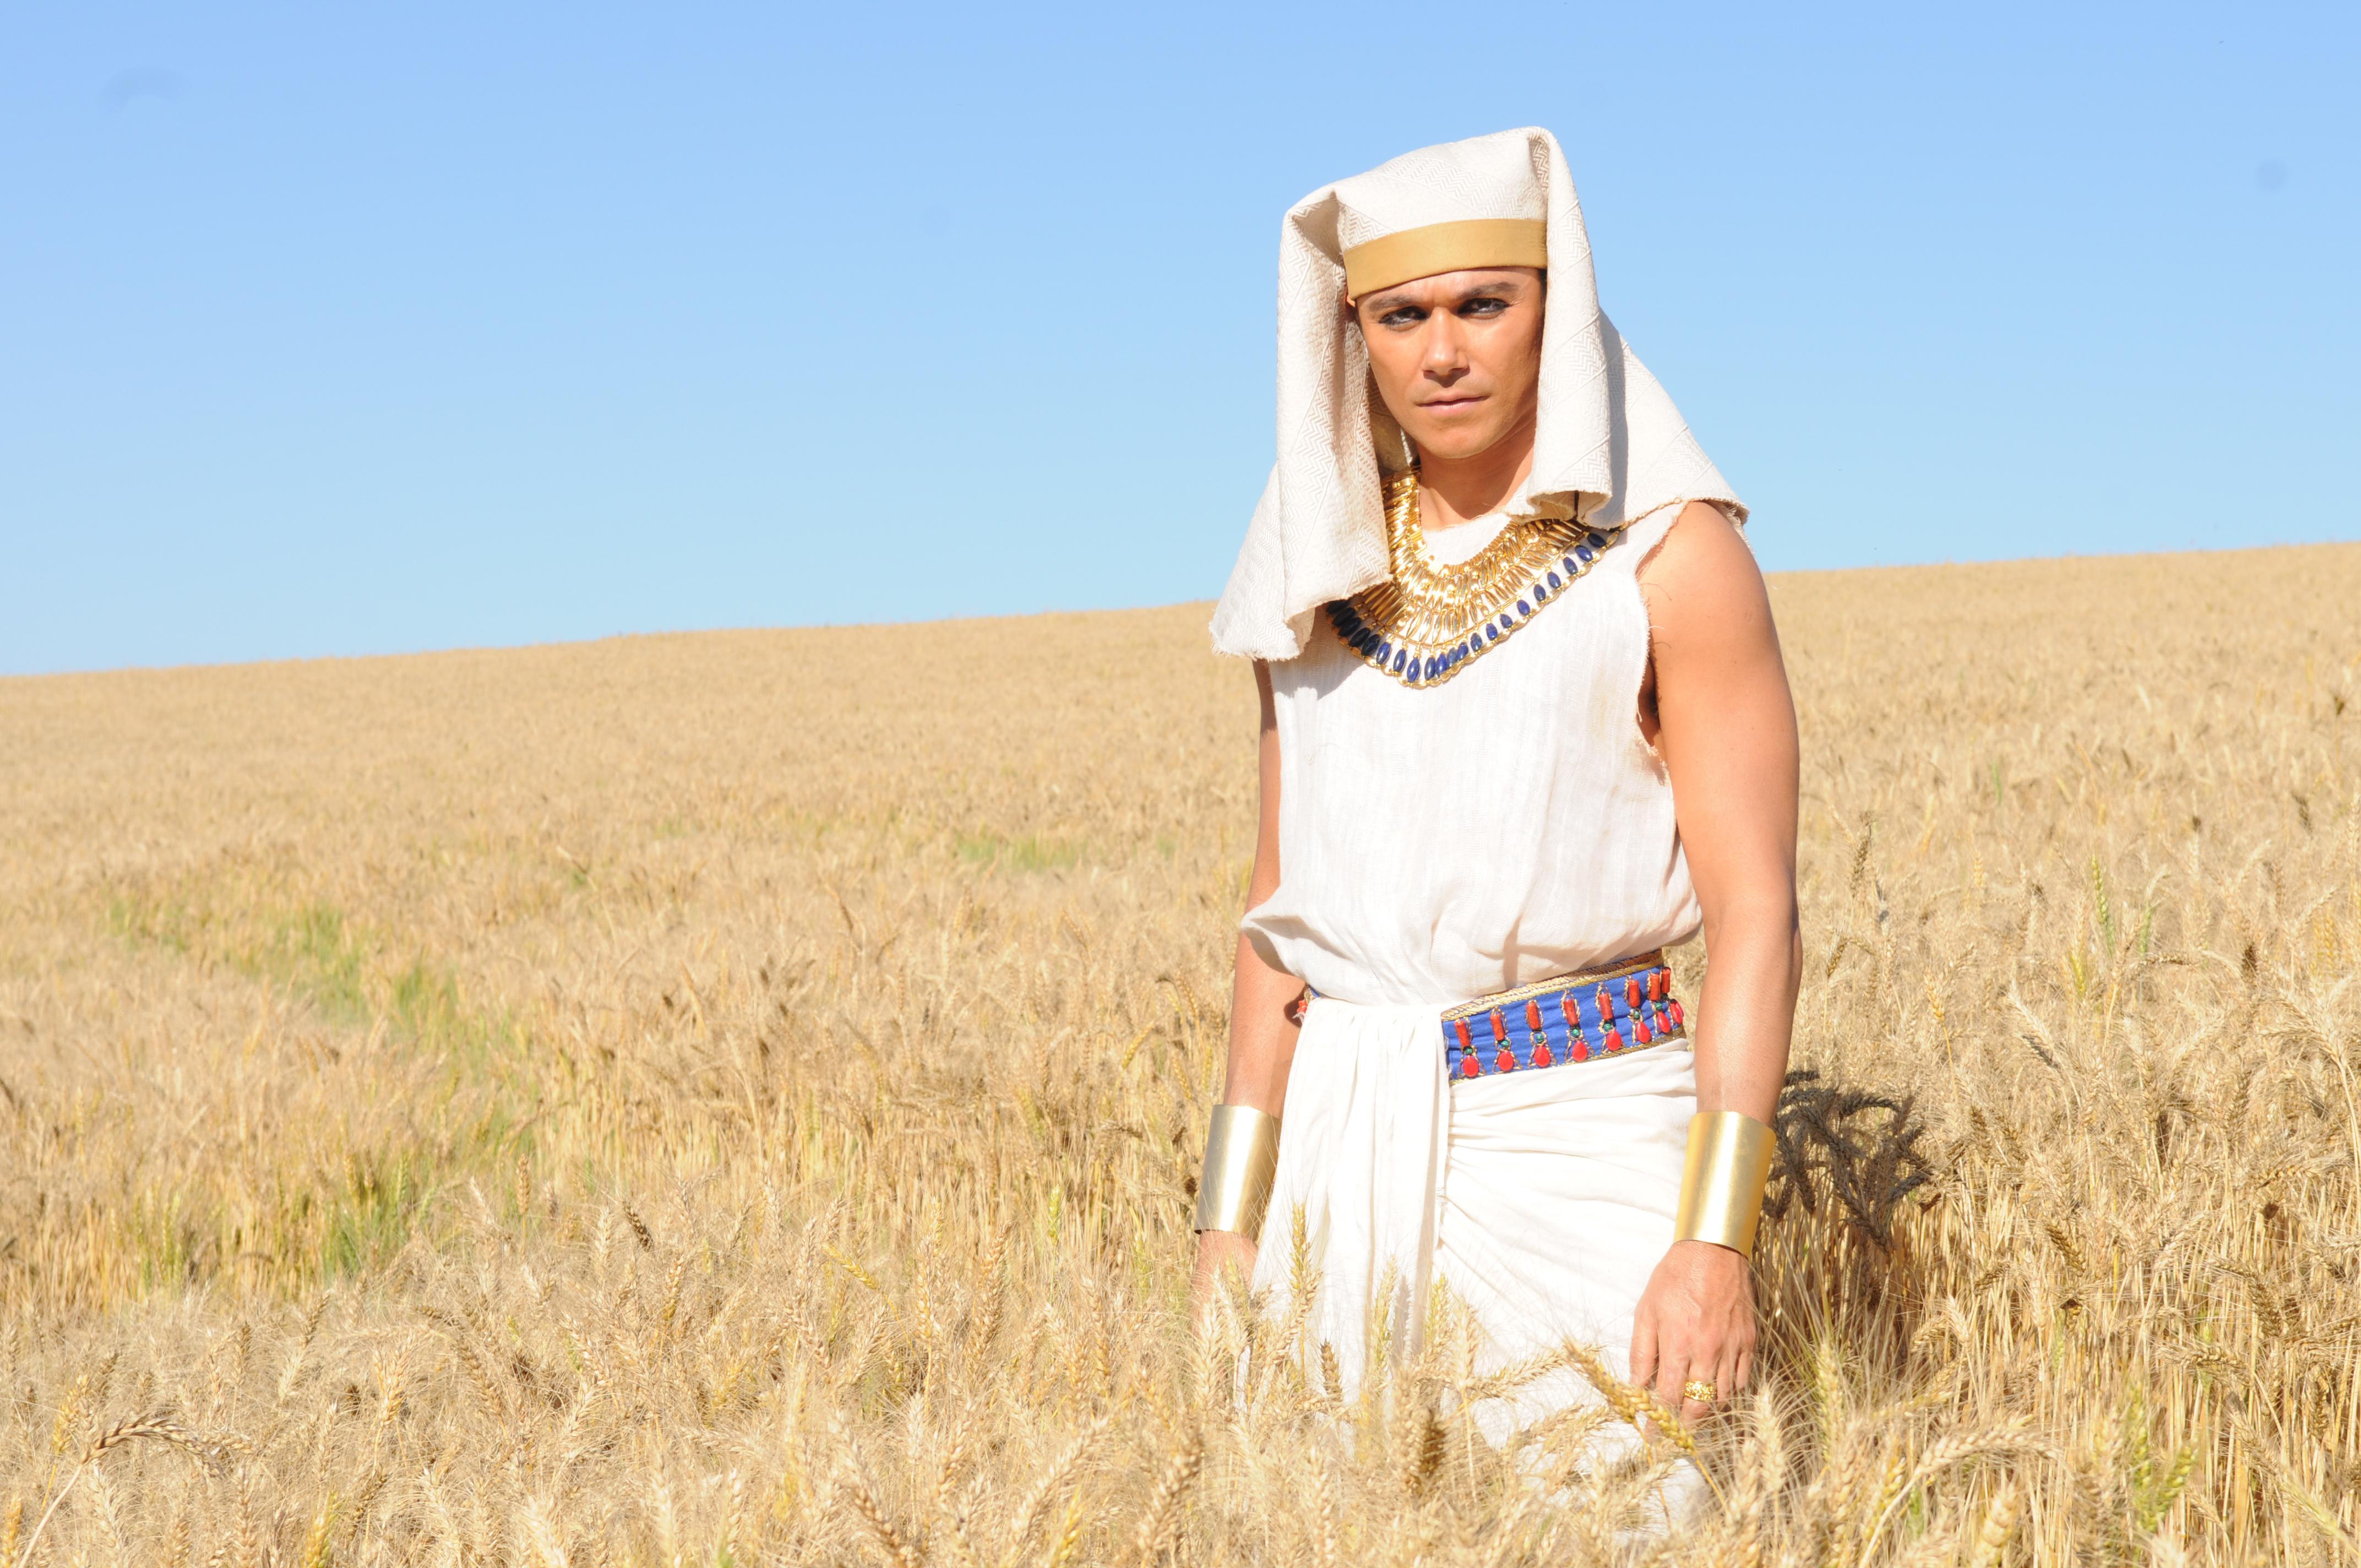 jose de egipto serie completa en español latino hd